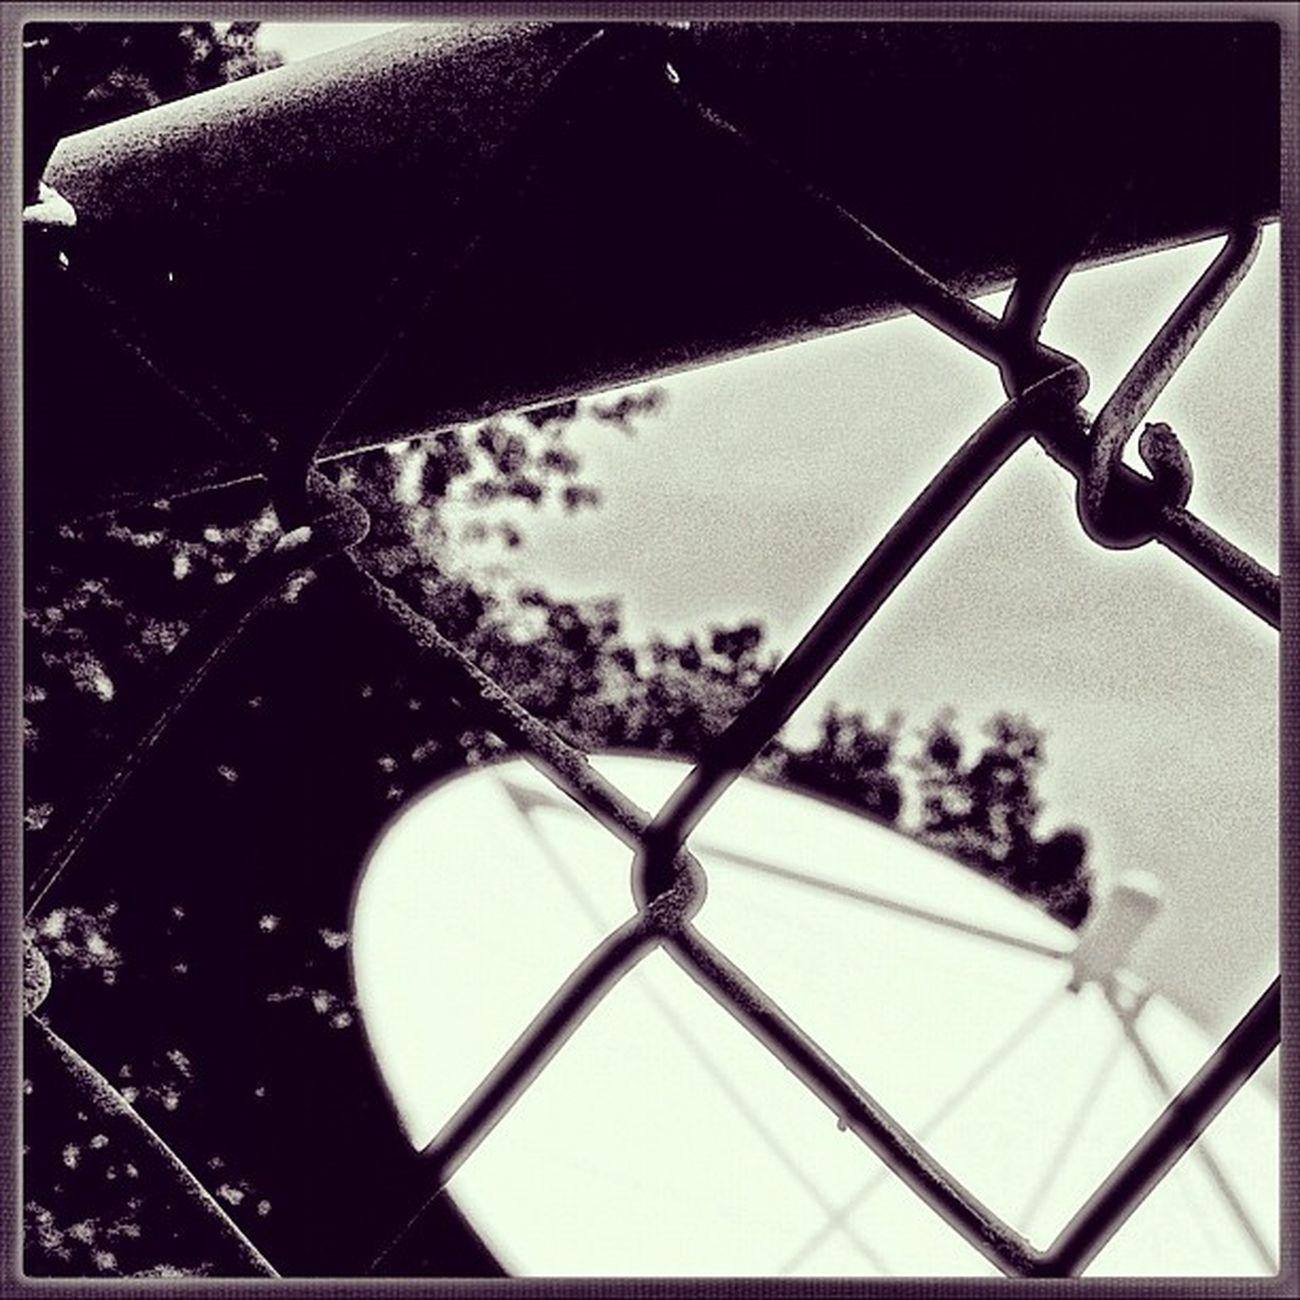 #chainlinkfence #blackandwhite #bw #black #white #bnw #mono #nb #igersbnw #monoart #bw_lover #monochrome #bwoftheday #blancinegre Bwoftheday Blackandwhite White Chainlinkfence Black Monochrome Bw Mono Bnw Monoart Nb  Bw_lover Blancinegre 50likes Igersbnw